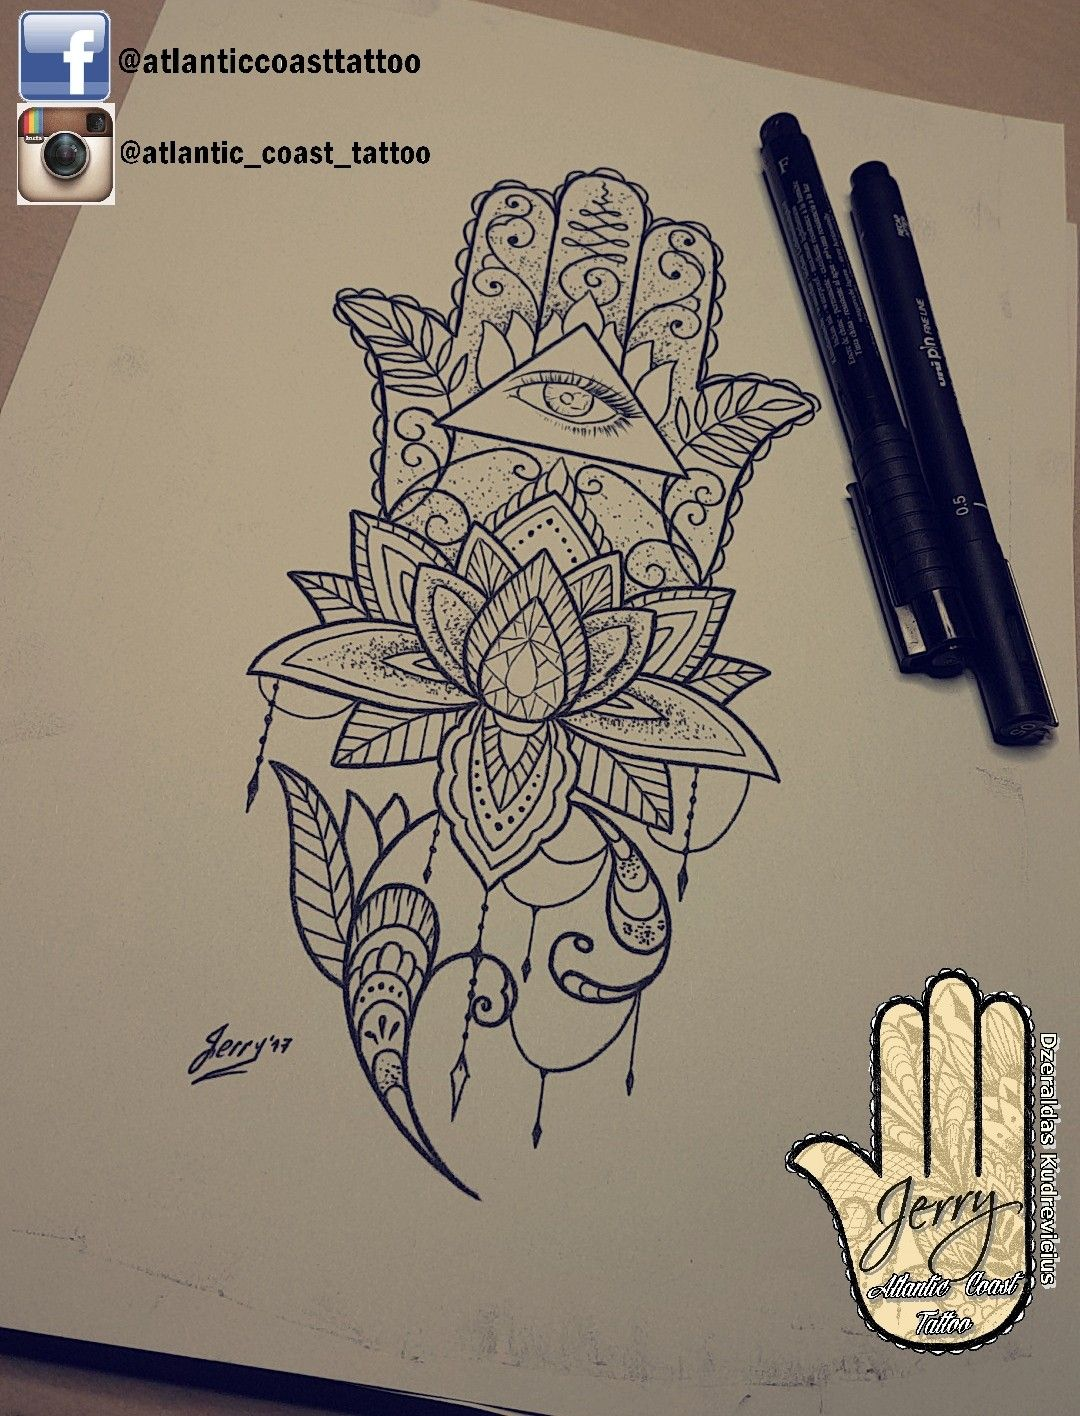 Tattoo Idea Design By Dzeraldas Jerry Kudrevicius From Atlantic